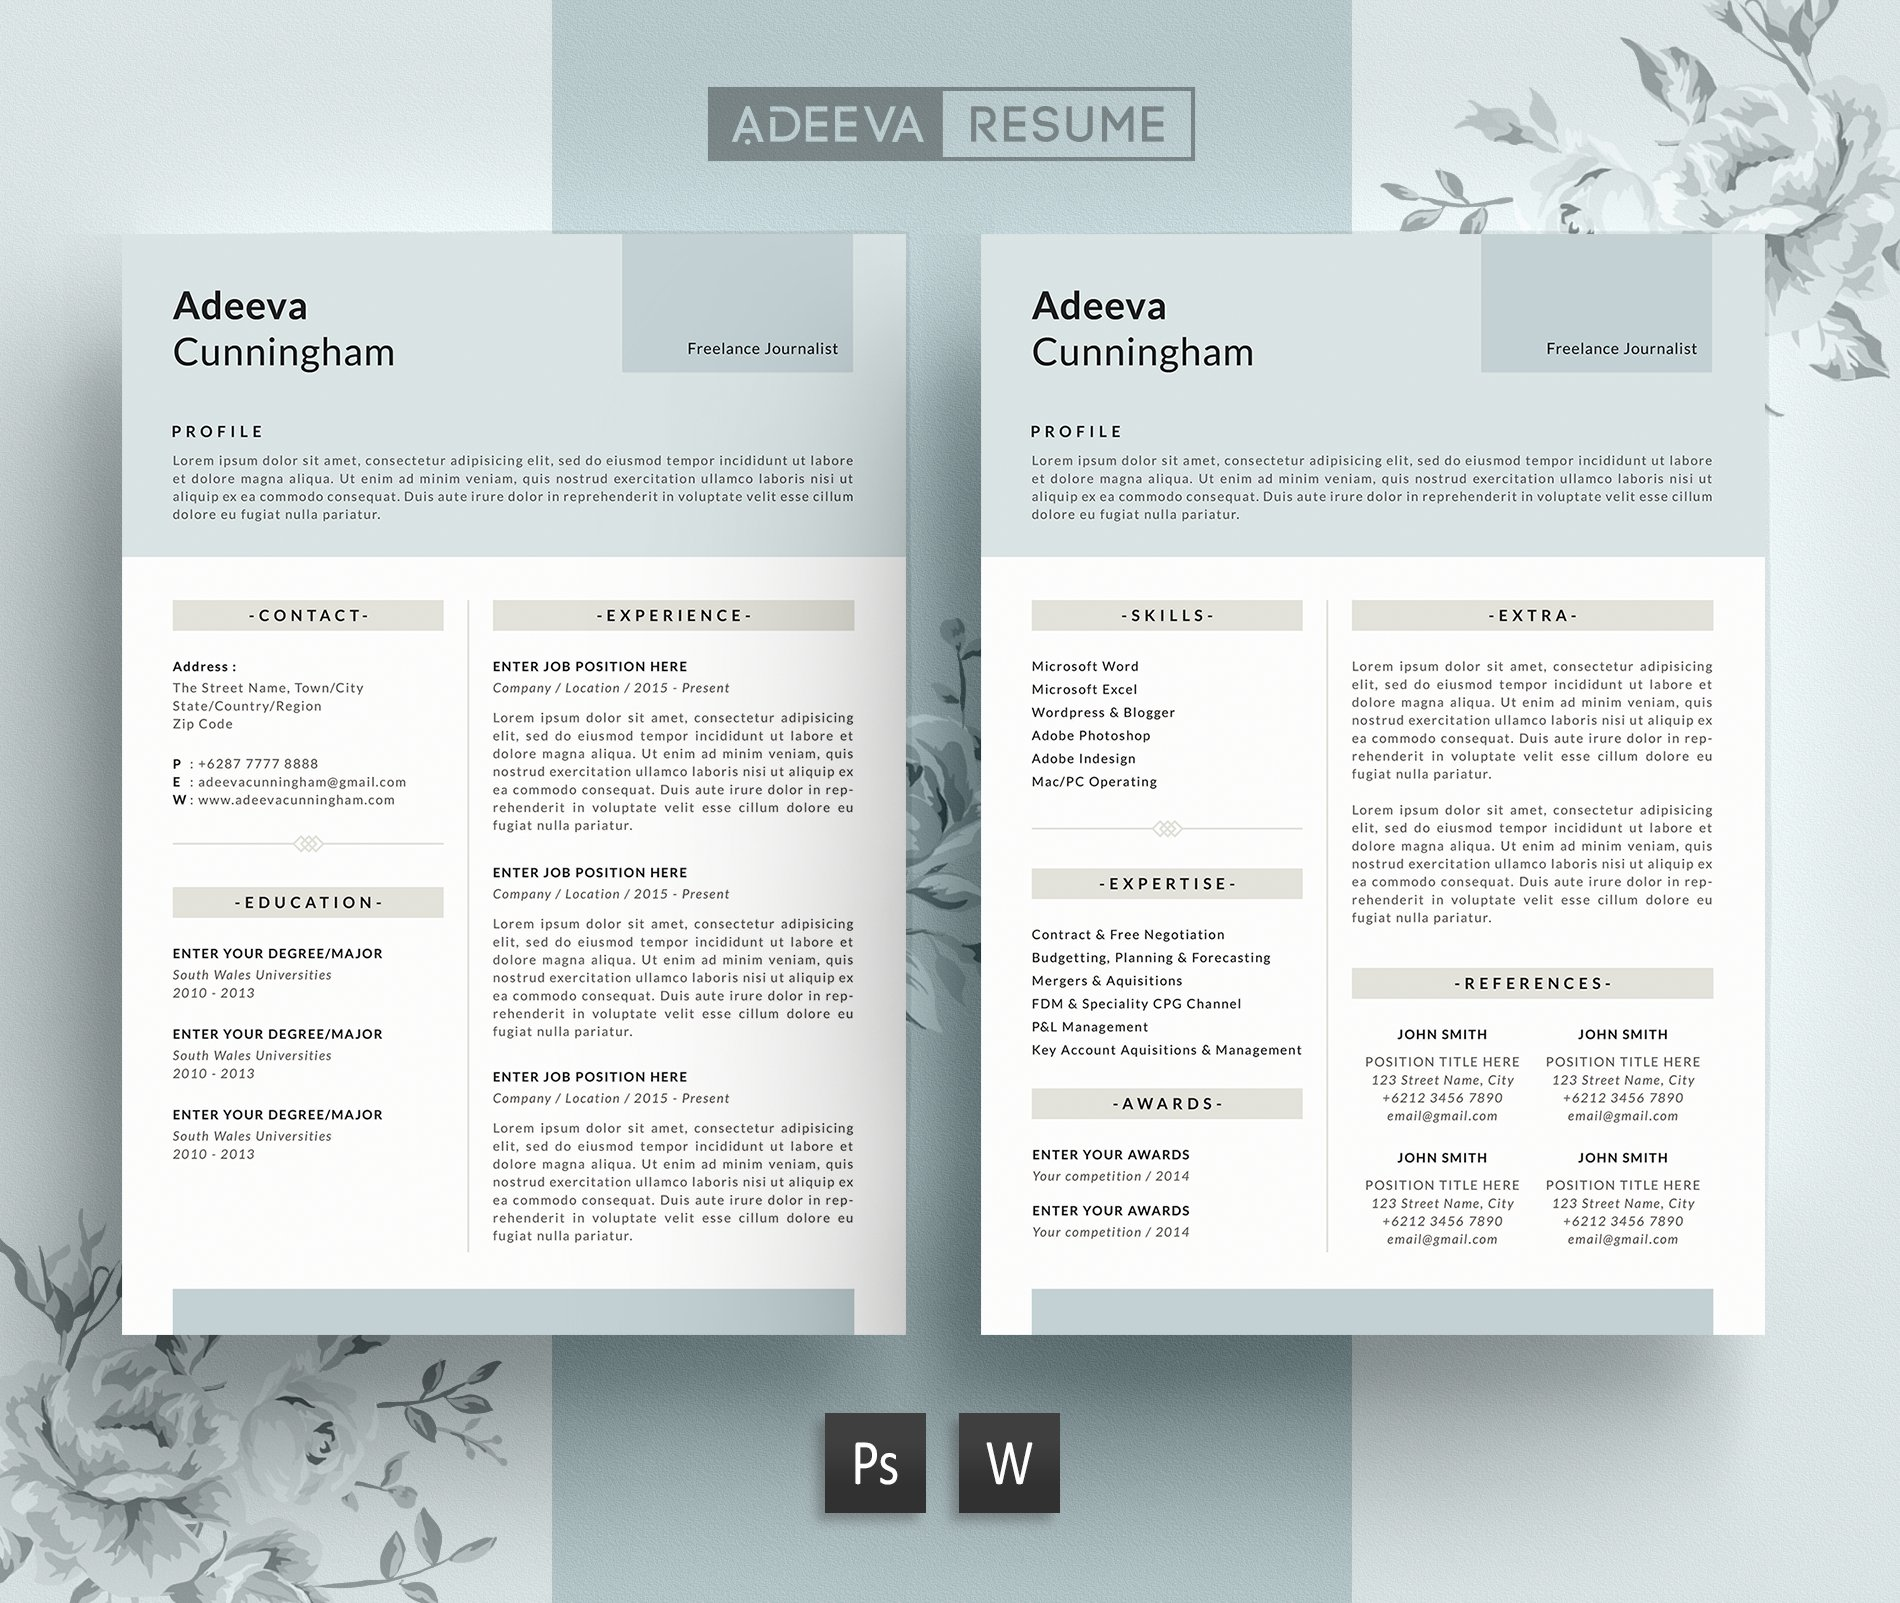 Simple Basic Resume Template Download: Simple Resume Template Cunningham